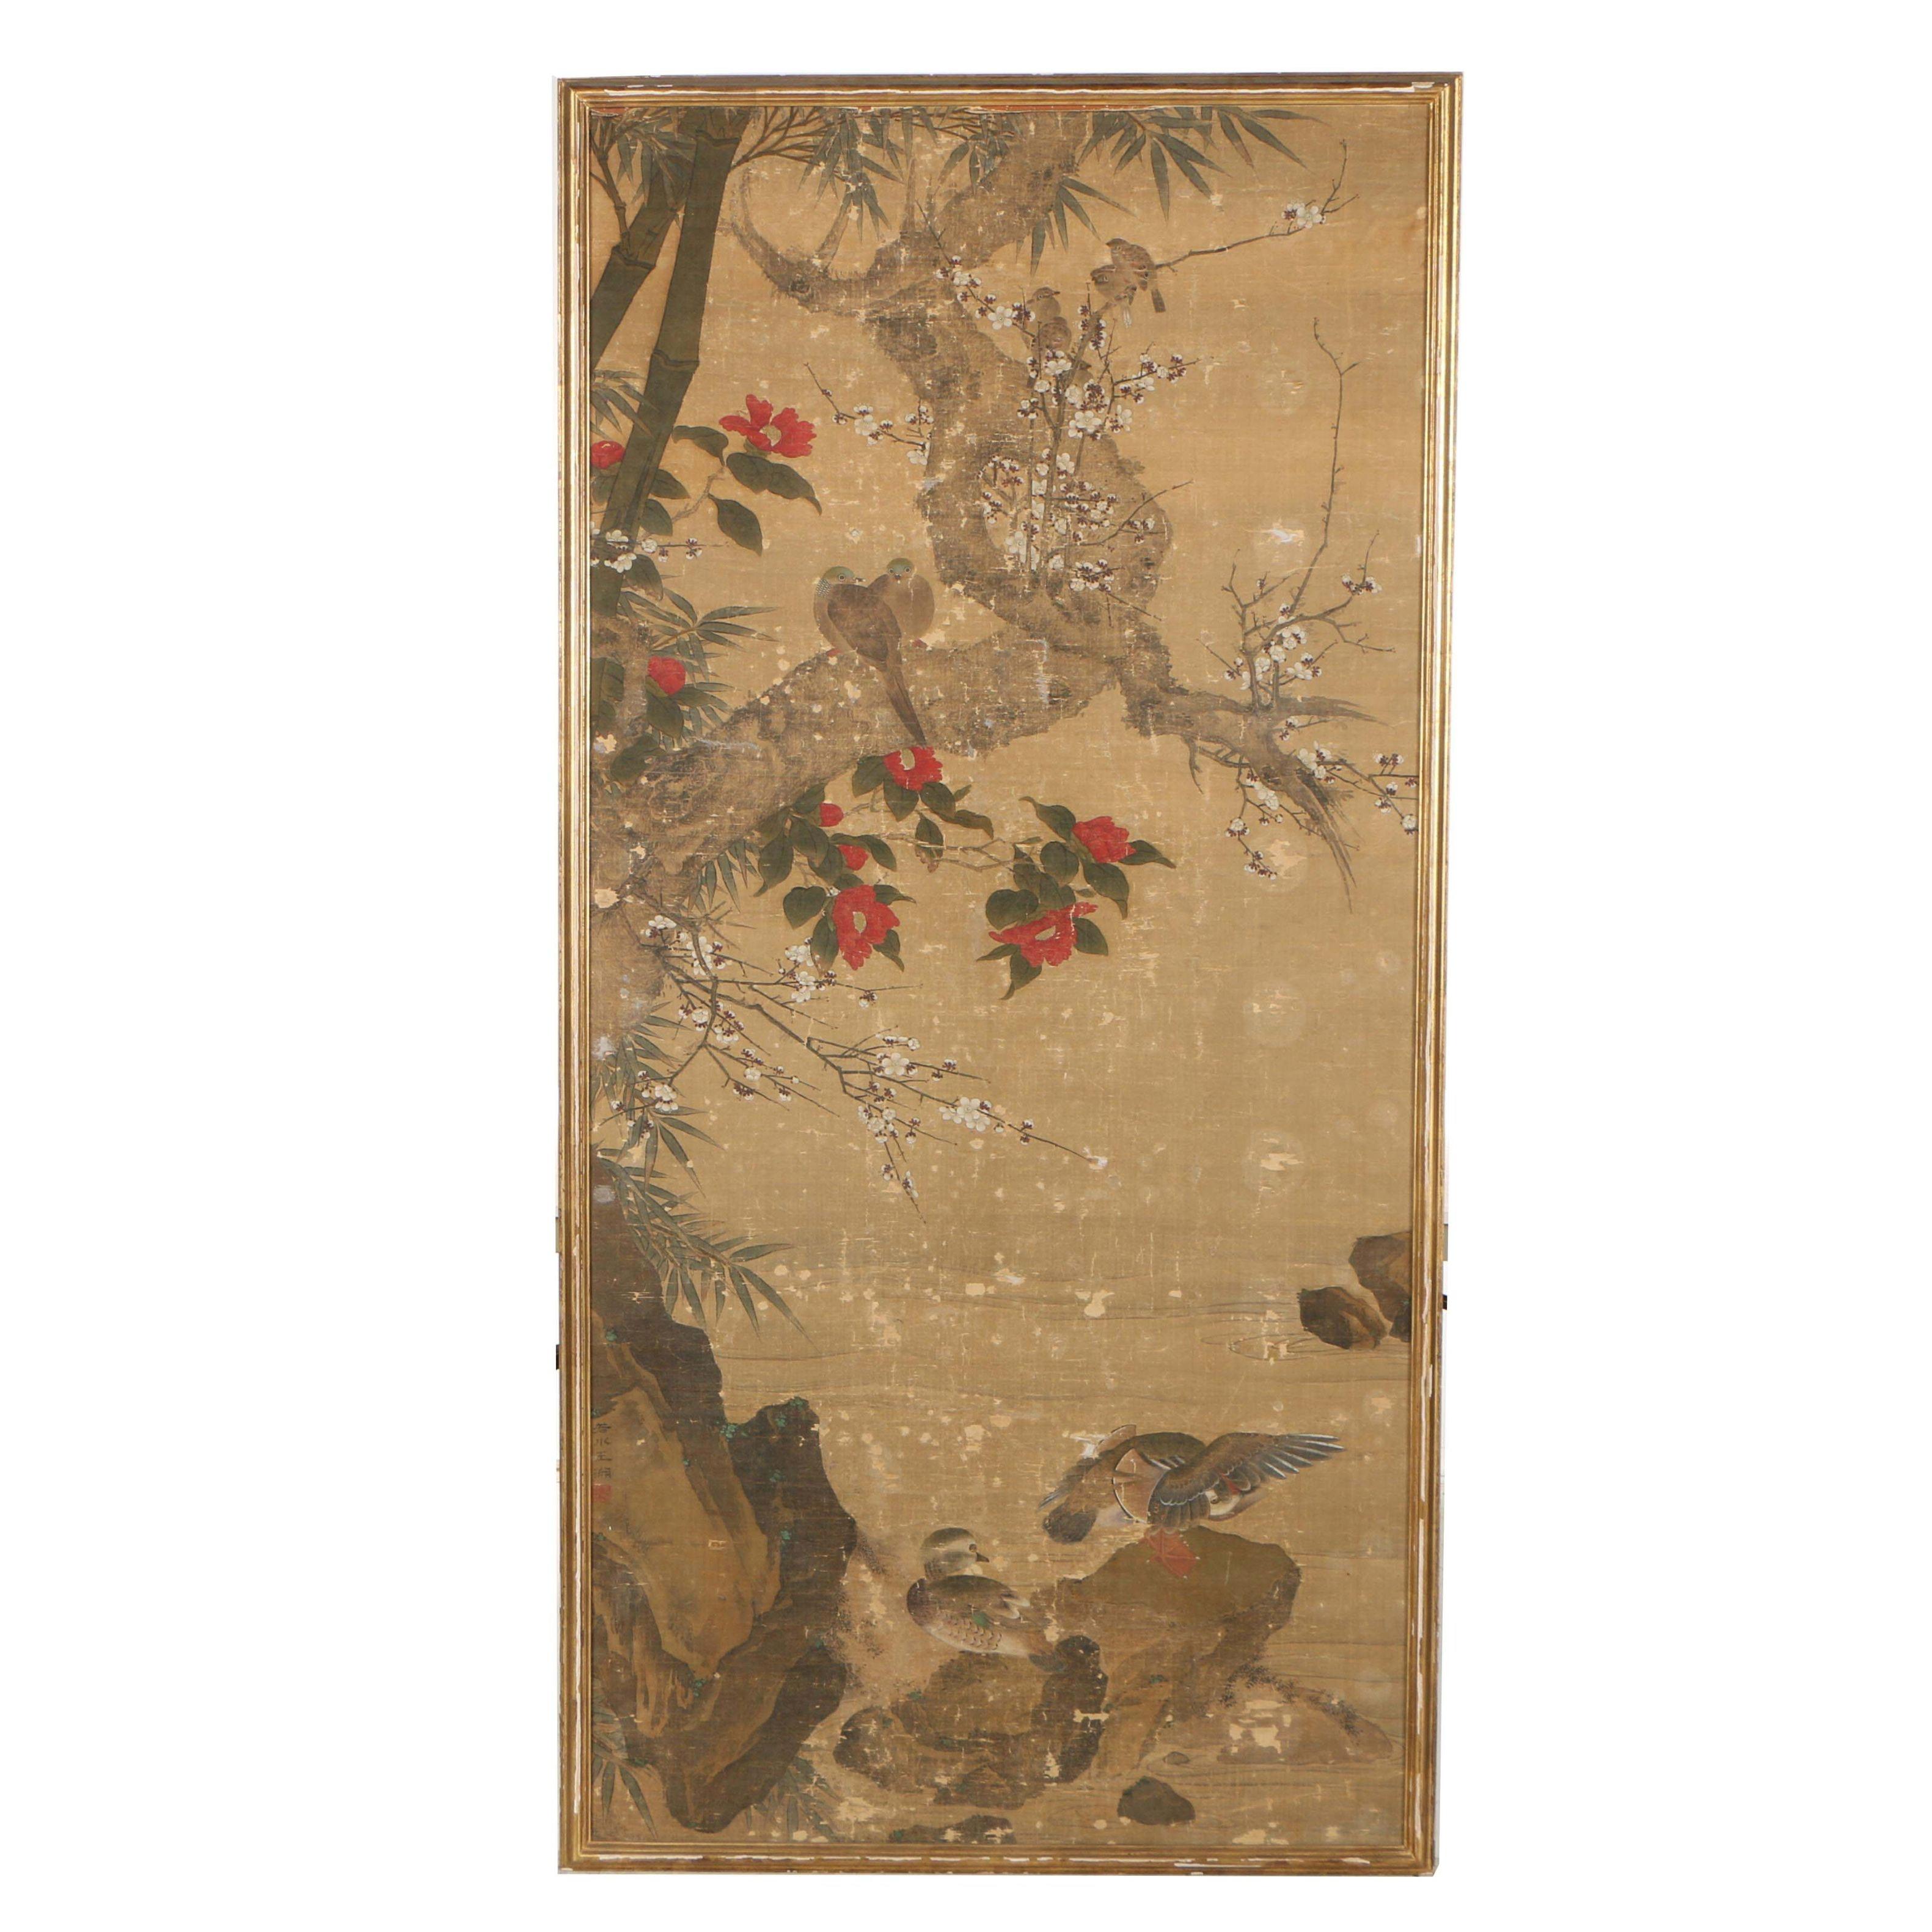 Chinese Gouache Painting on Silk of Mandarin Ducks and Plum Blossoms